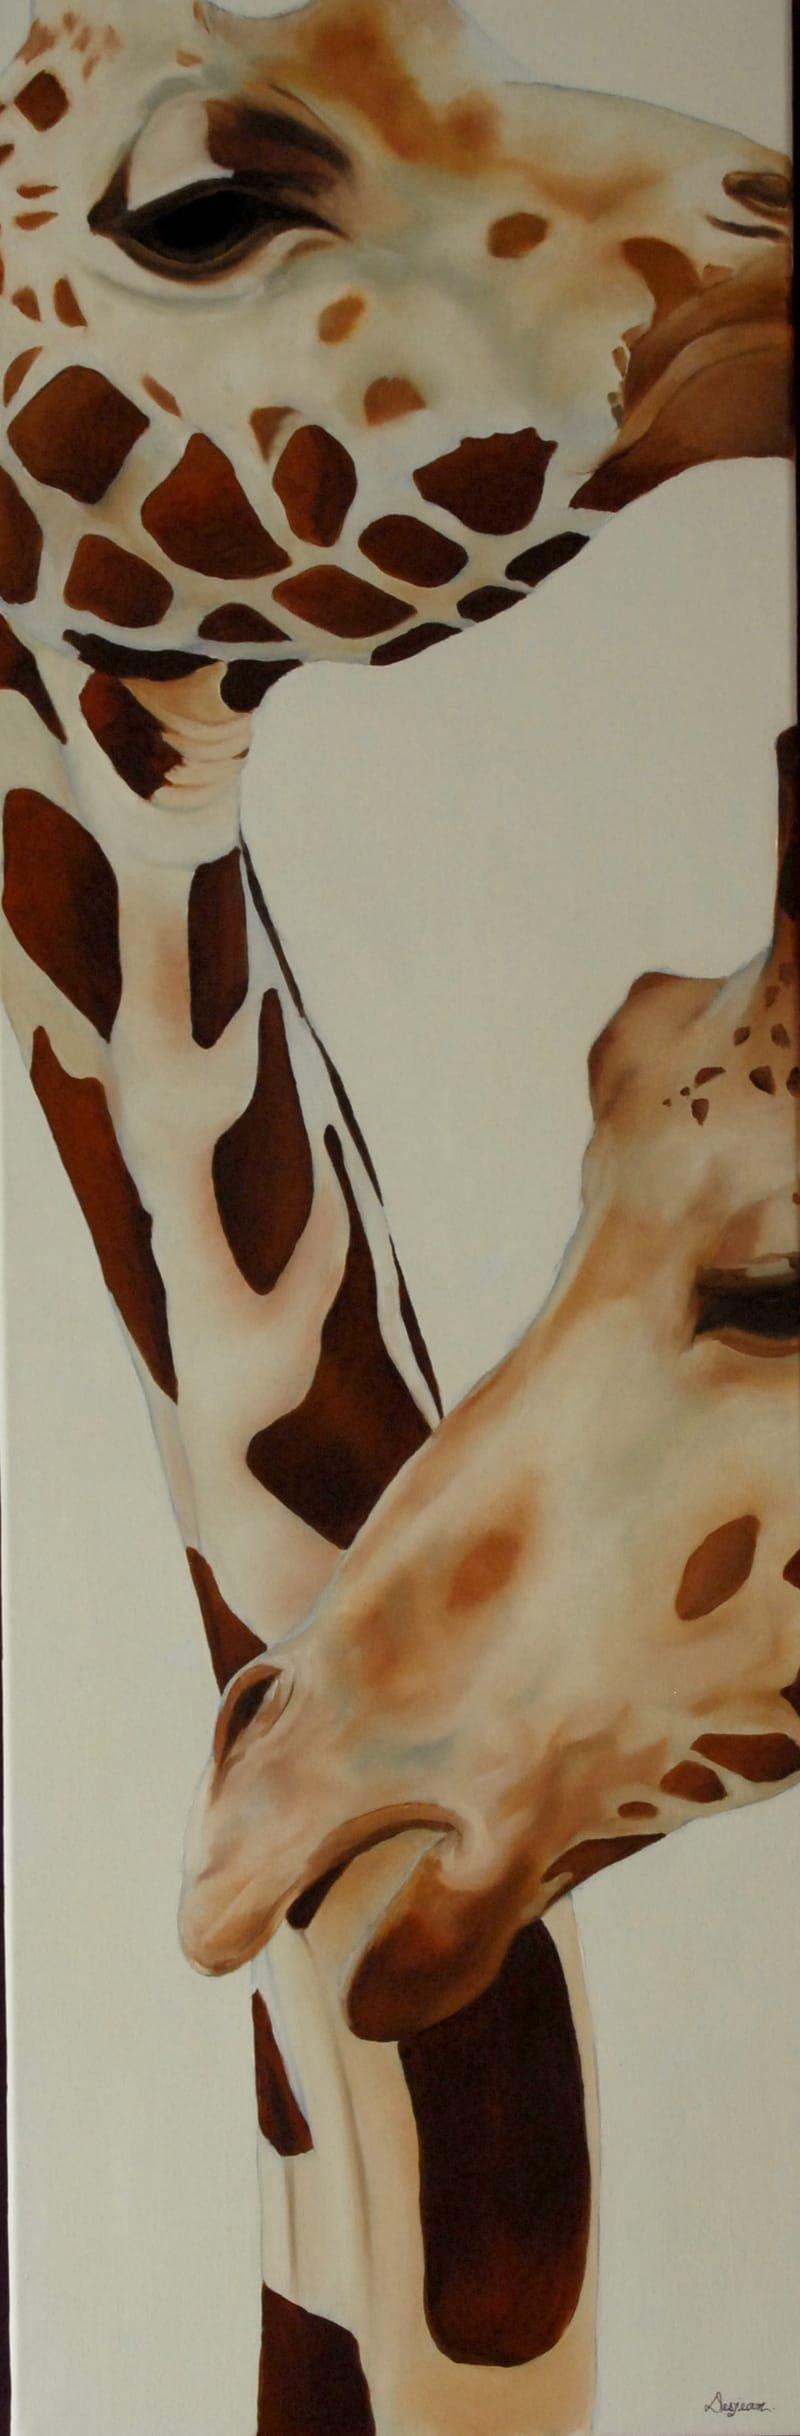 Série Girafes - 1